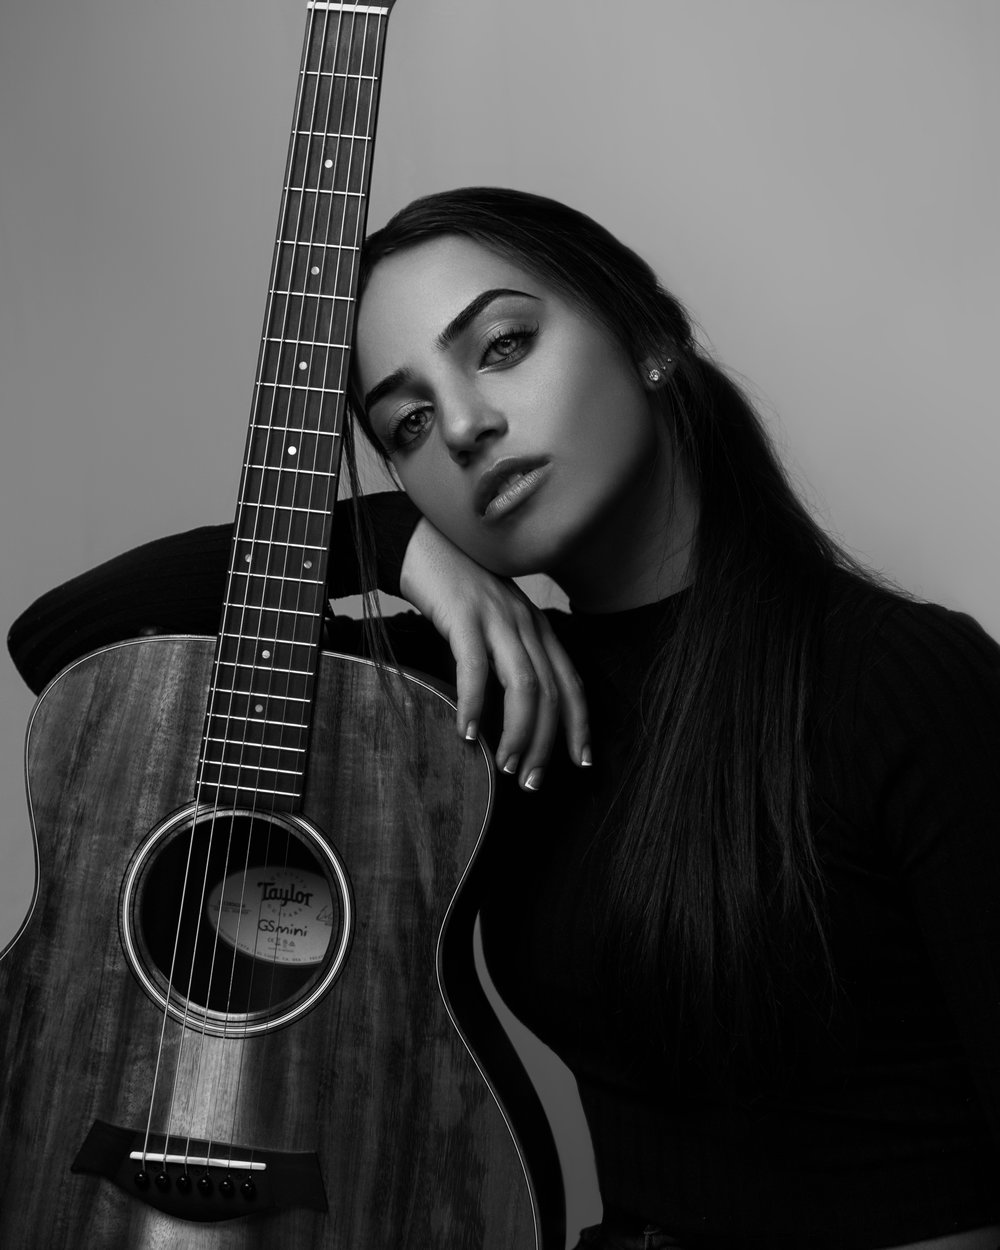 Samara and Her Guitar (c0py) 3.jpg